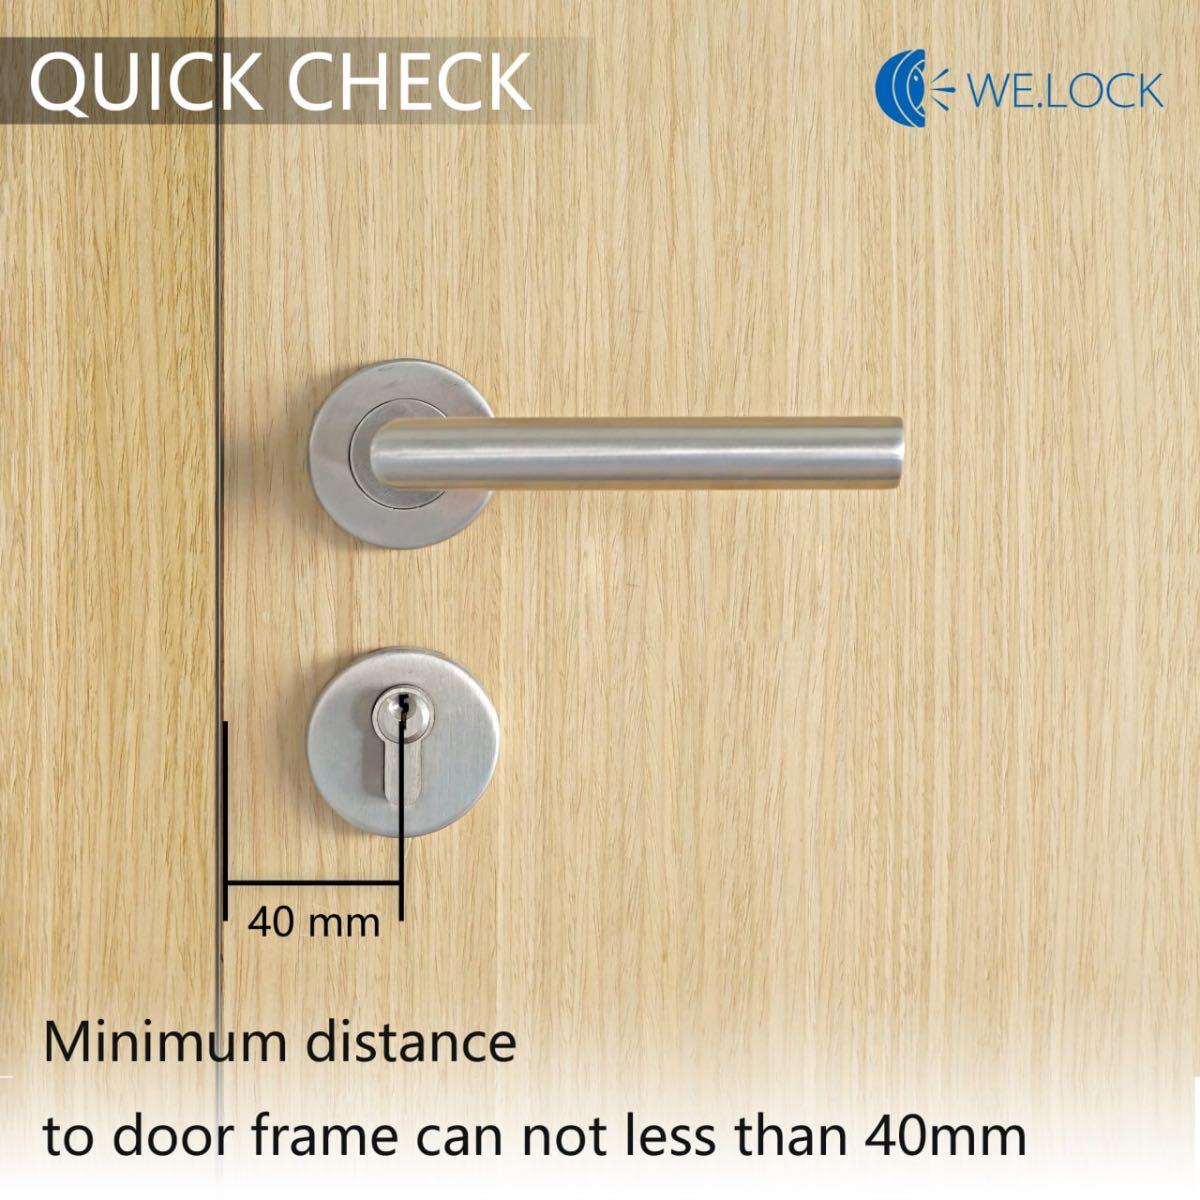 welock serratura smart card guida